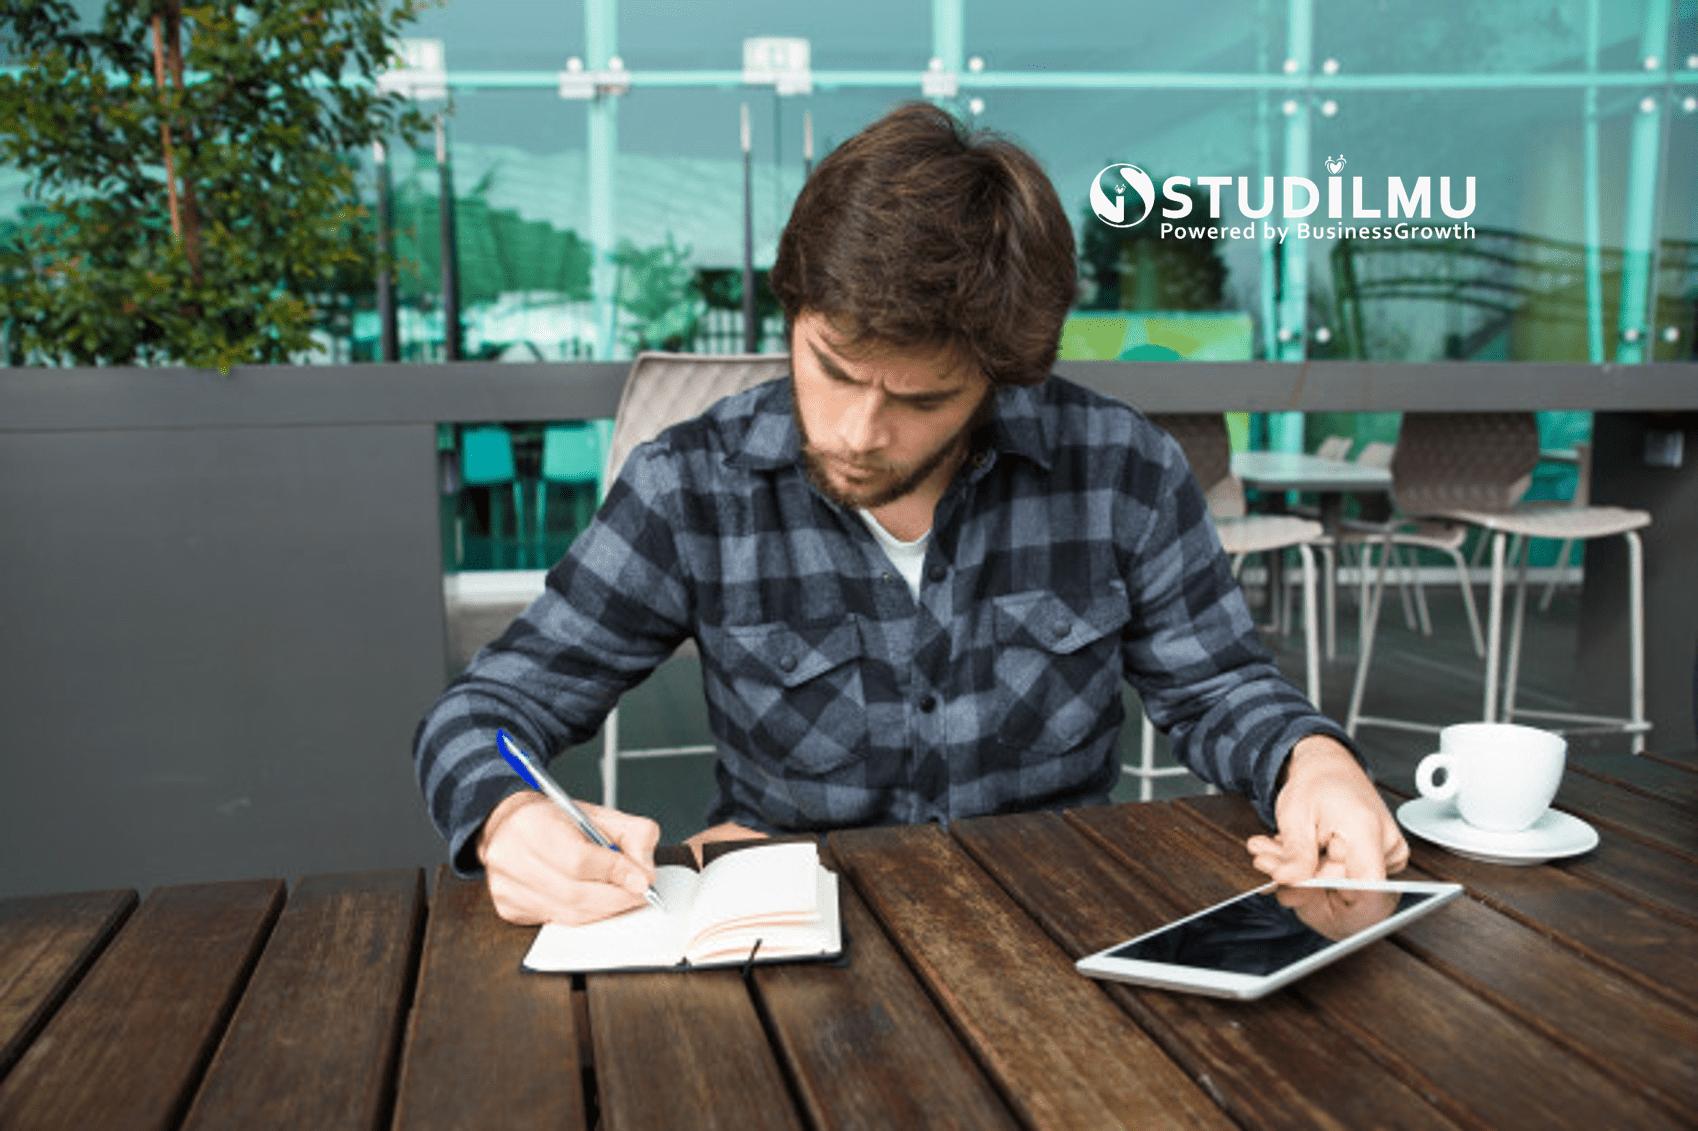 STUDILMU Career Advice - 7 Cara Meningkatkan Fokus di Tempat Kerja